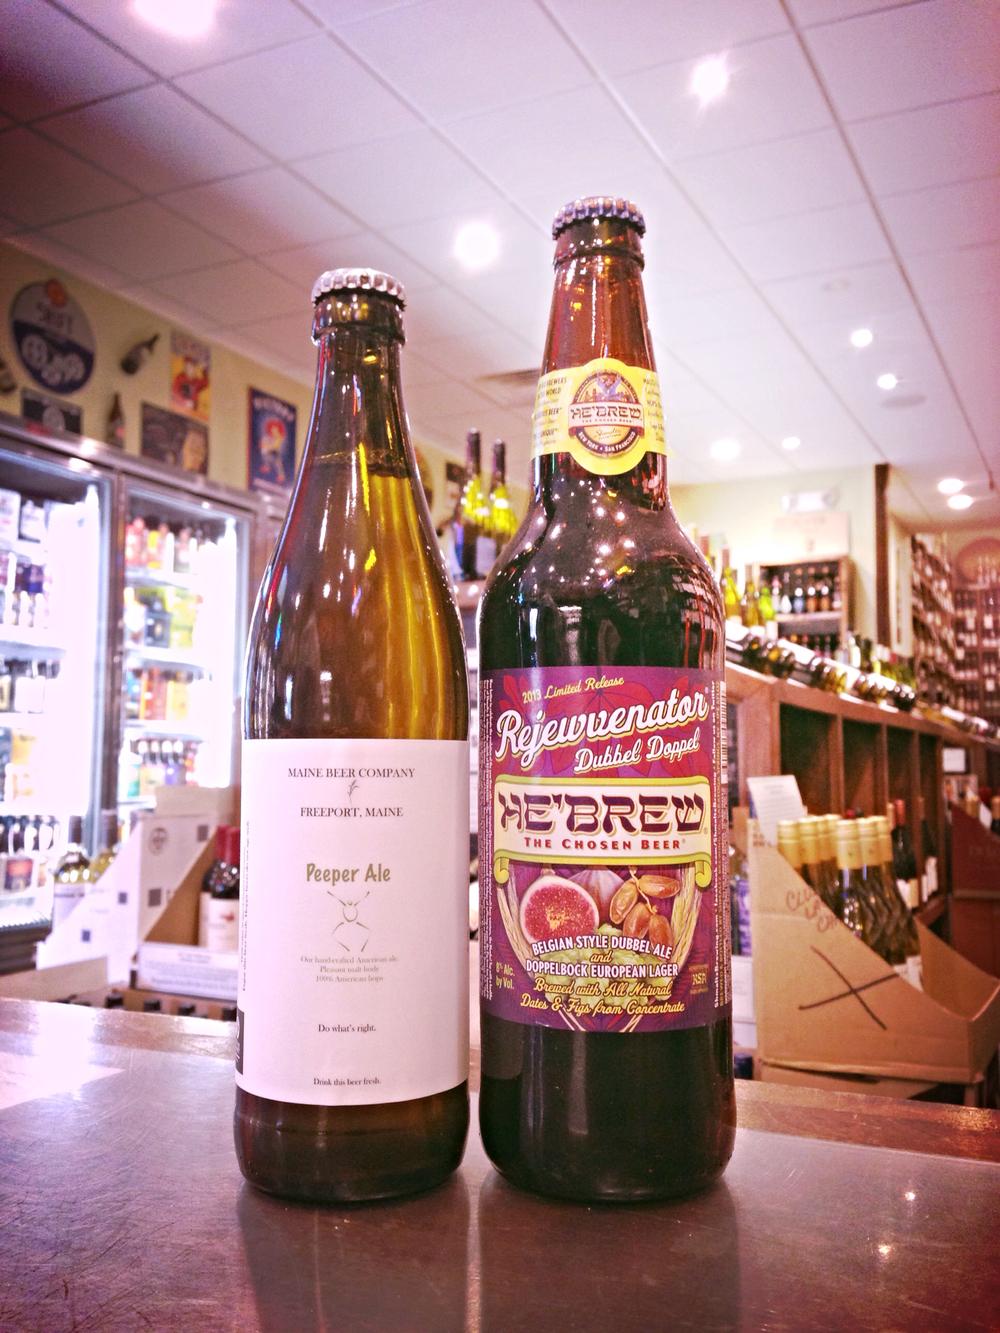 Maine Beer Peeper Ale and He'Brew Rejewvenator w/ Figs